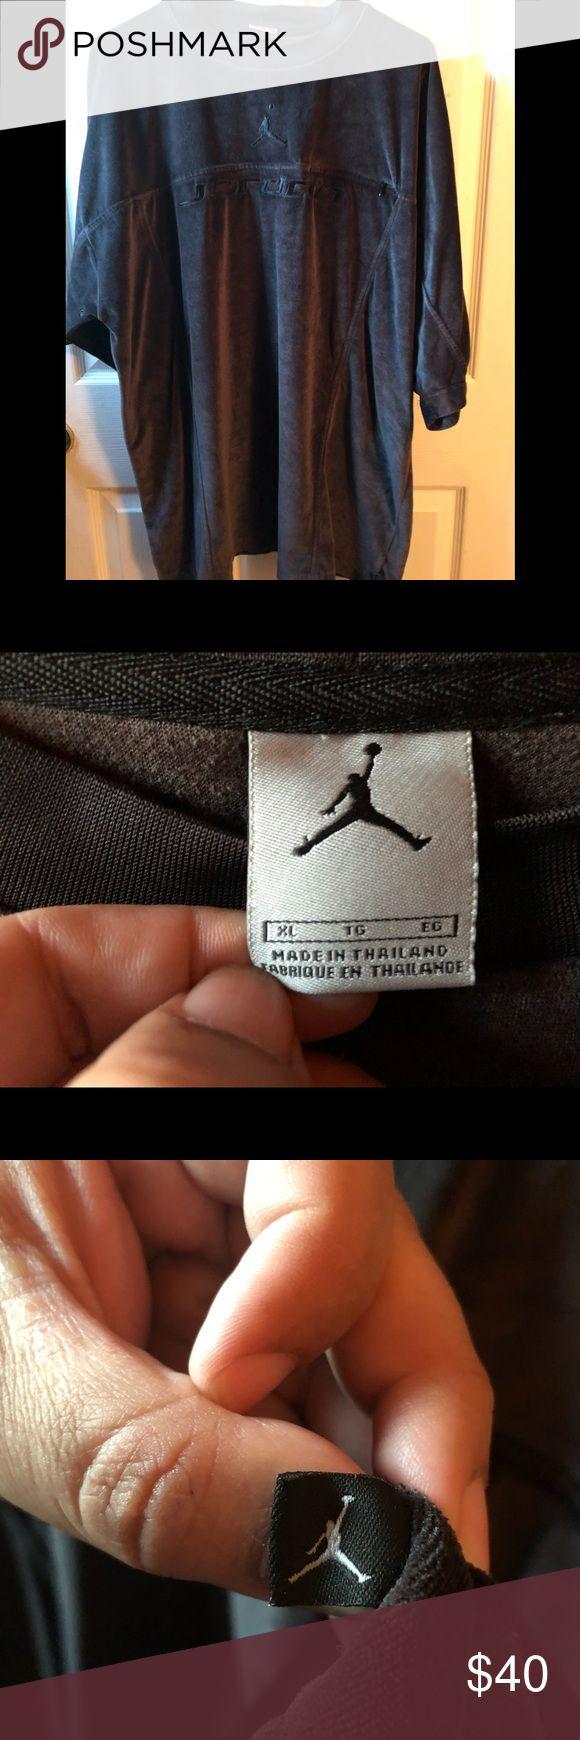 Men's Jordan Velvet Shirt Men's Jordan shirt. This item is gently used and is 100% polyester. In great condition!! 🔥 Michael Jordan Shirts Tees - Short Sleeve